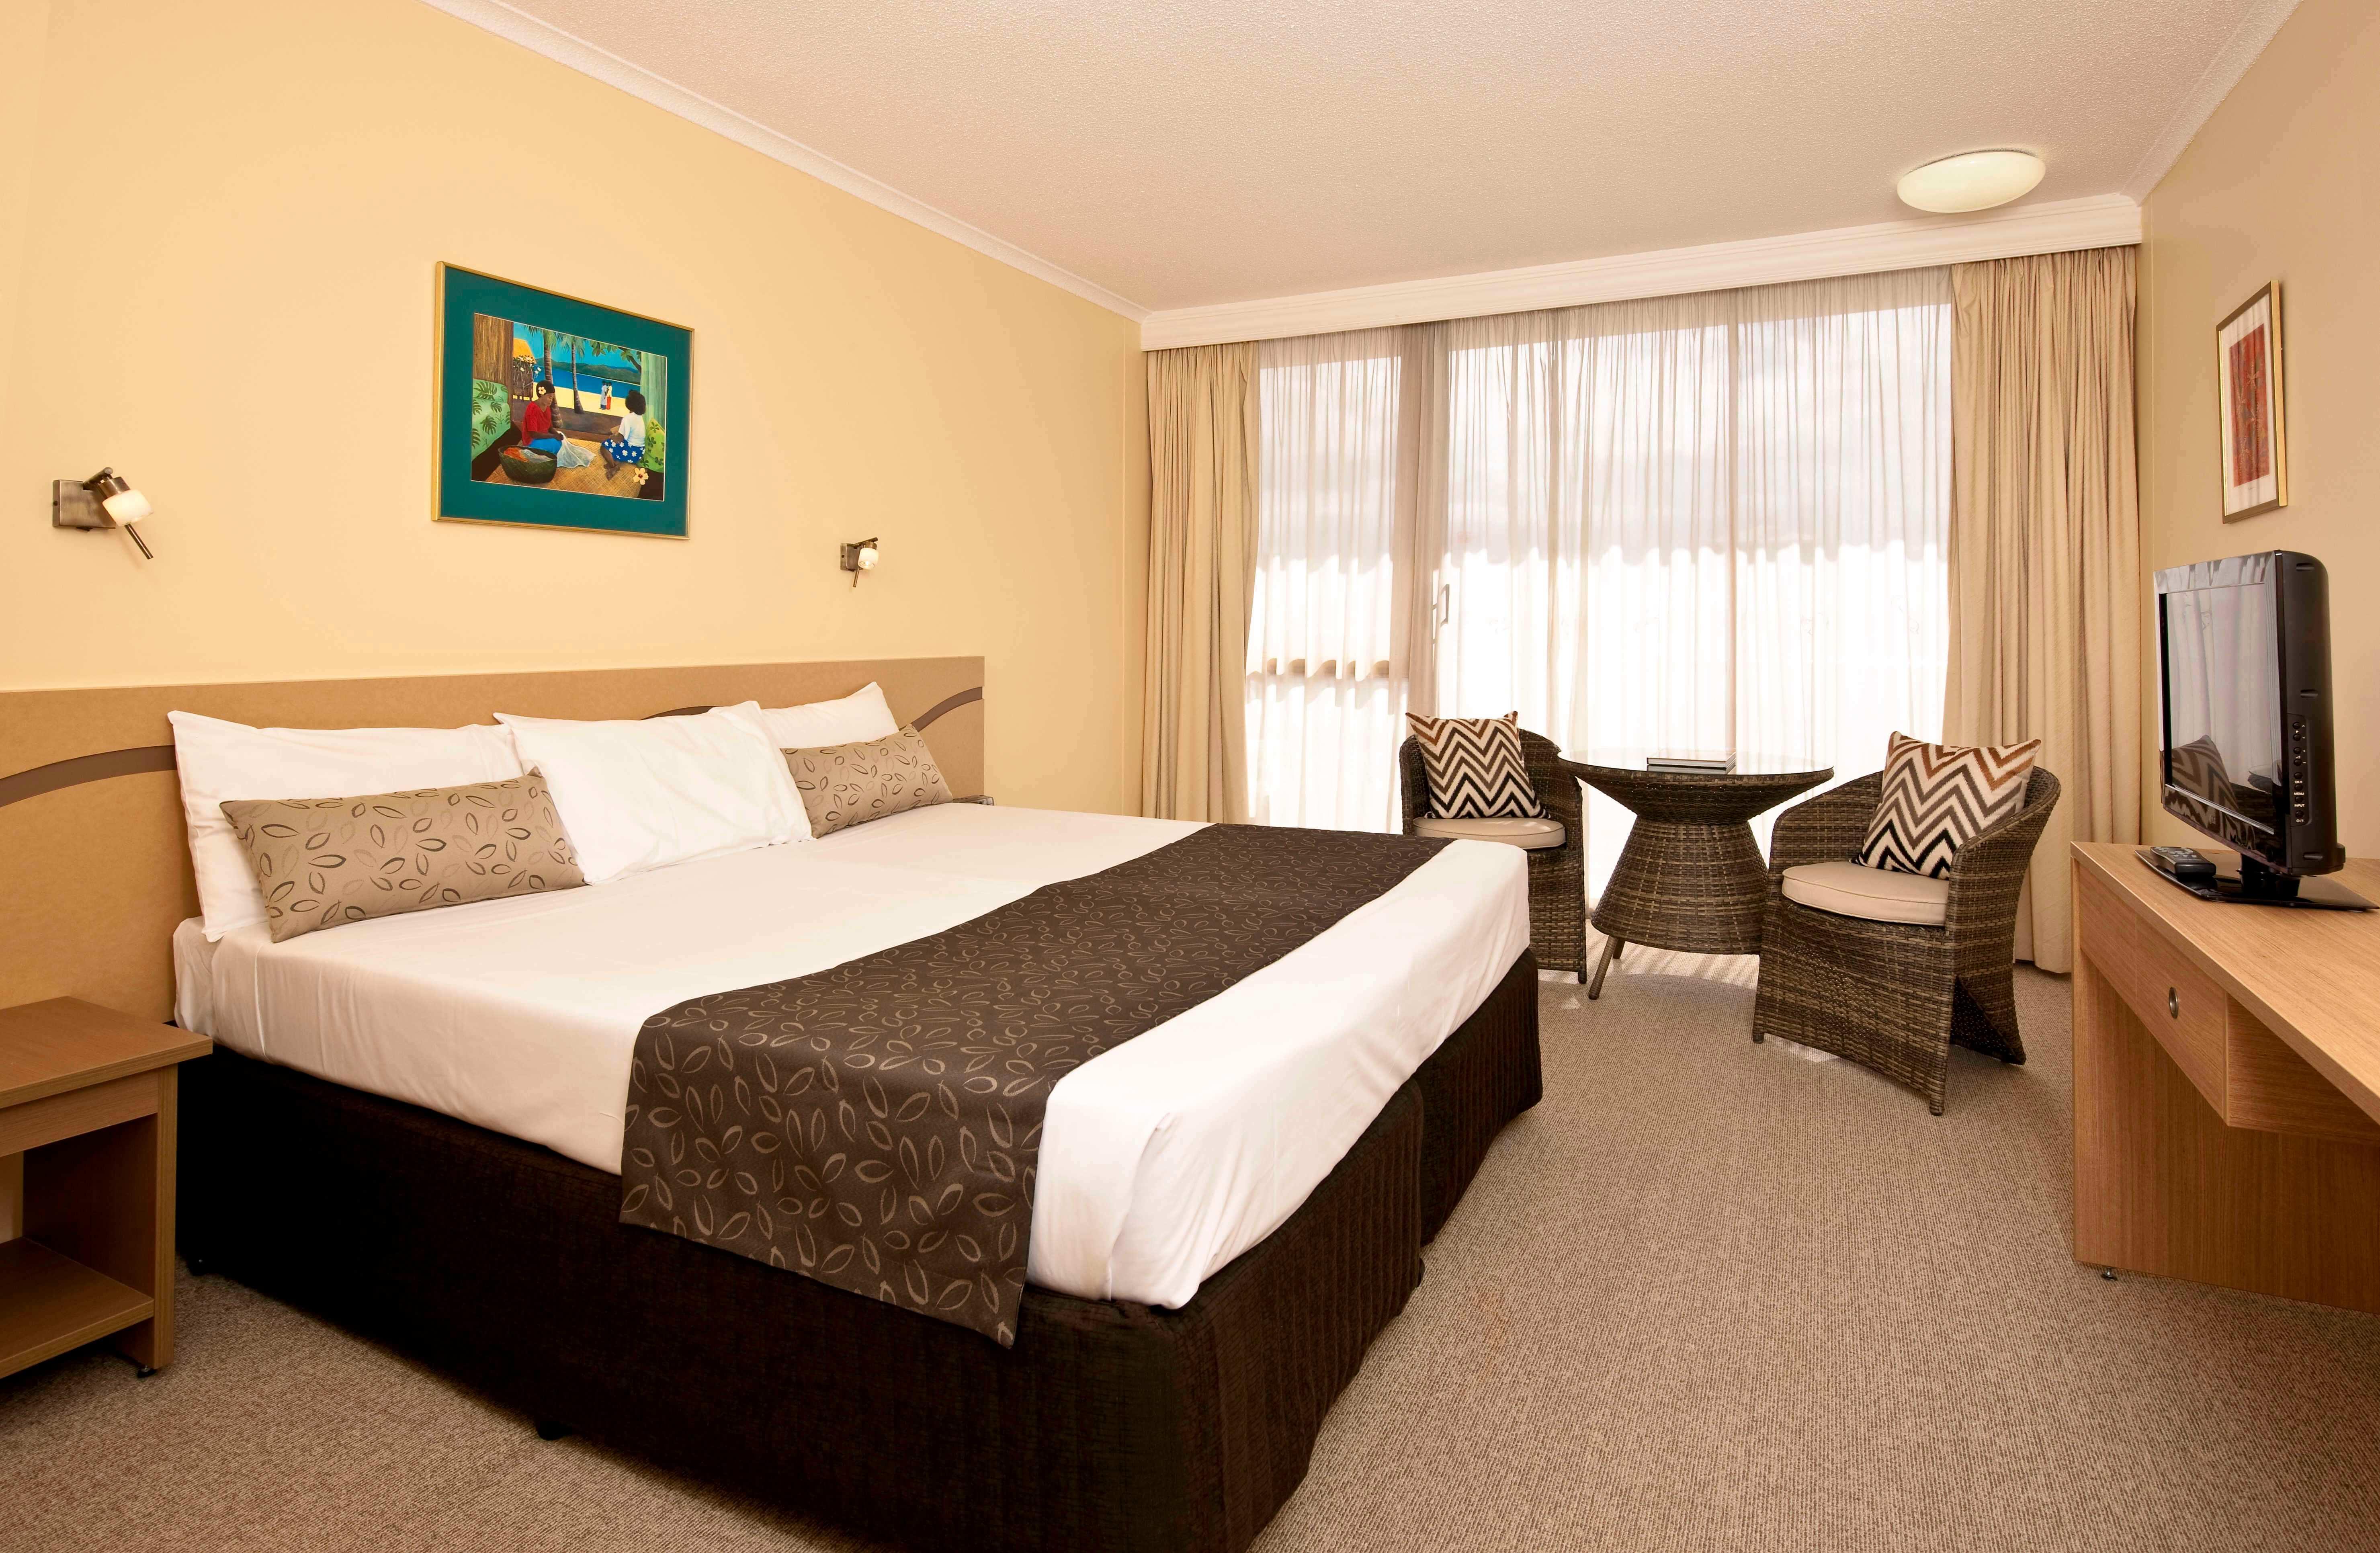 Pacific International Hotel bedroom